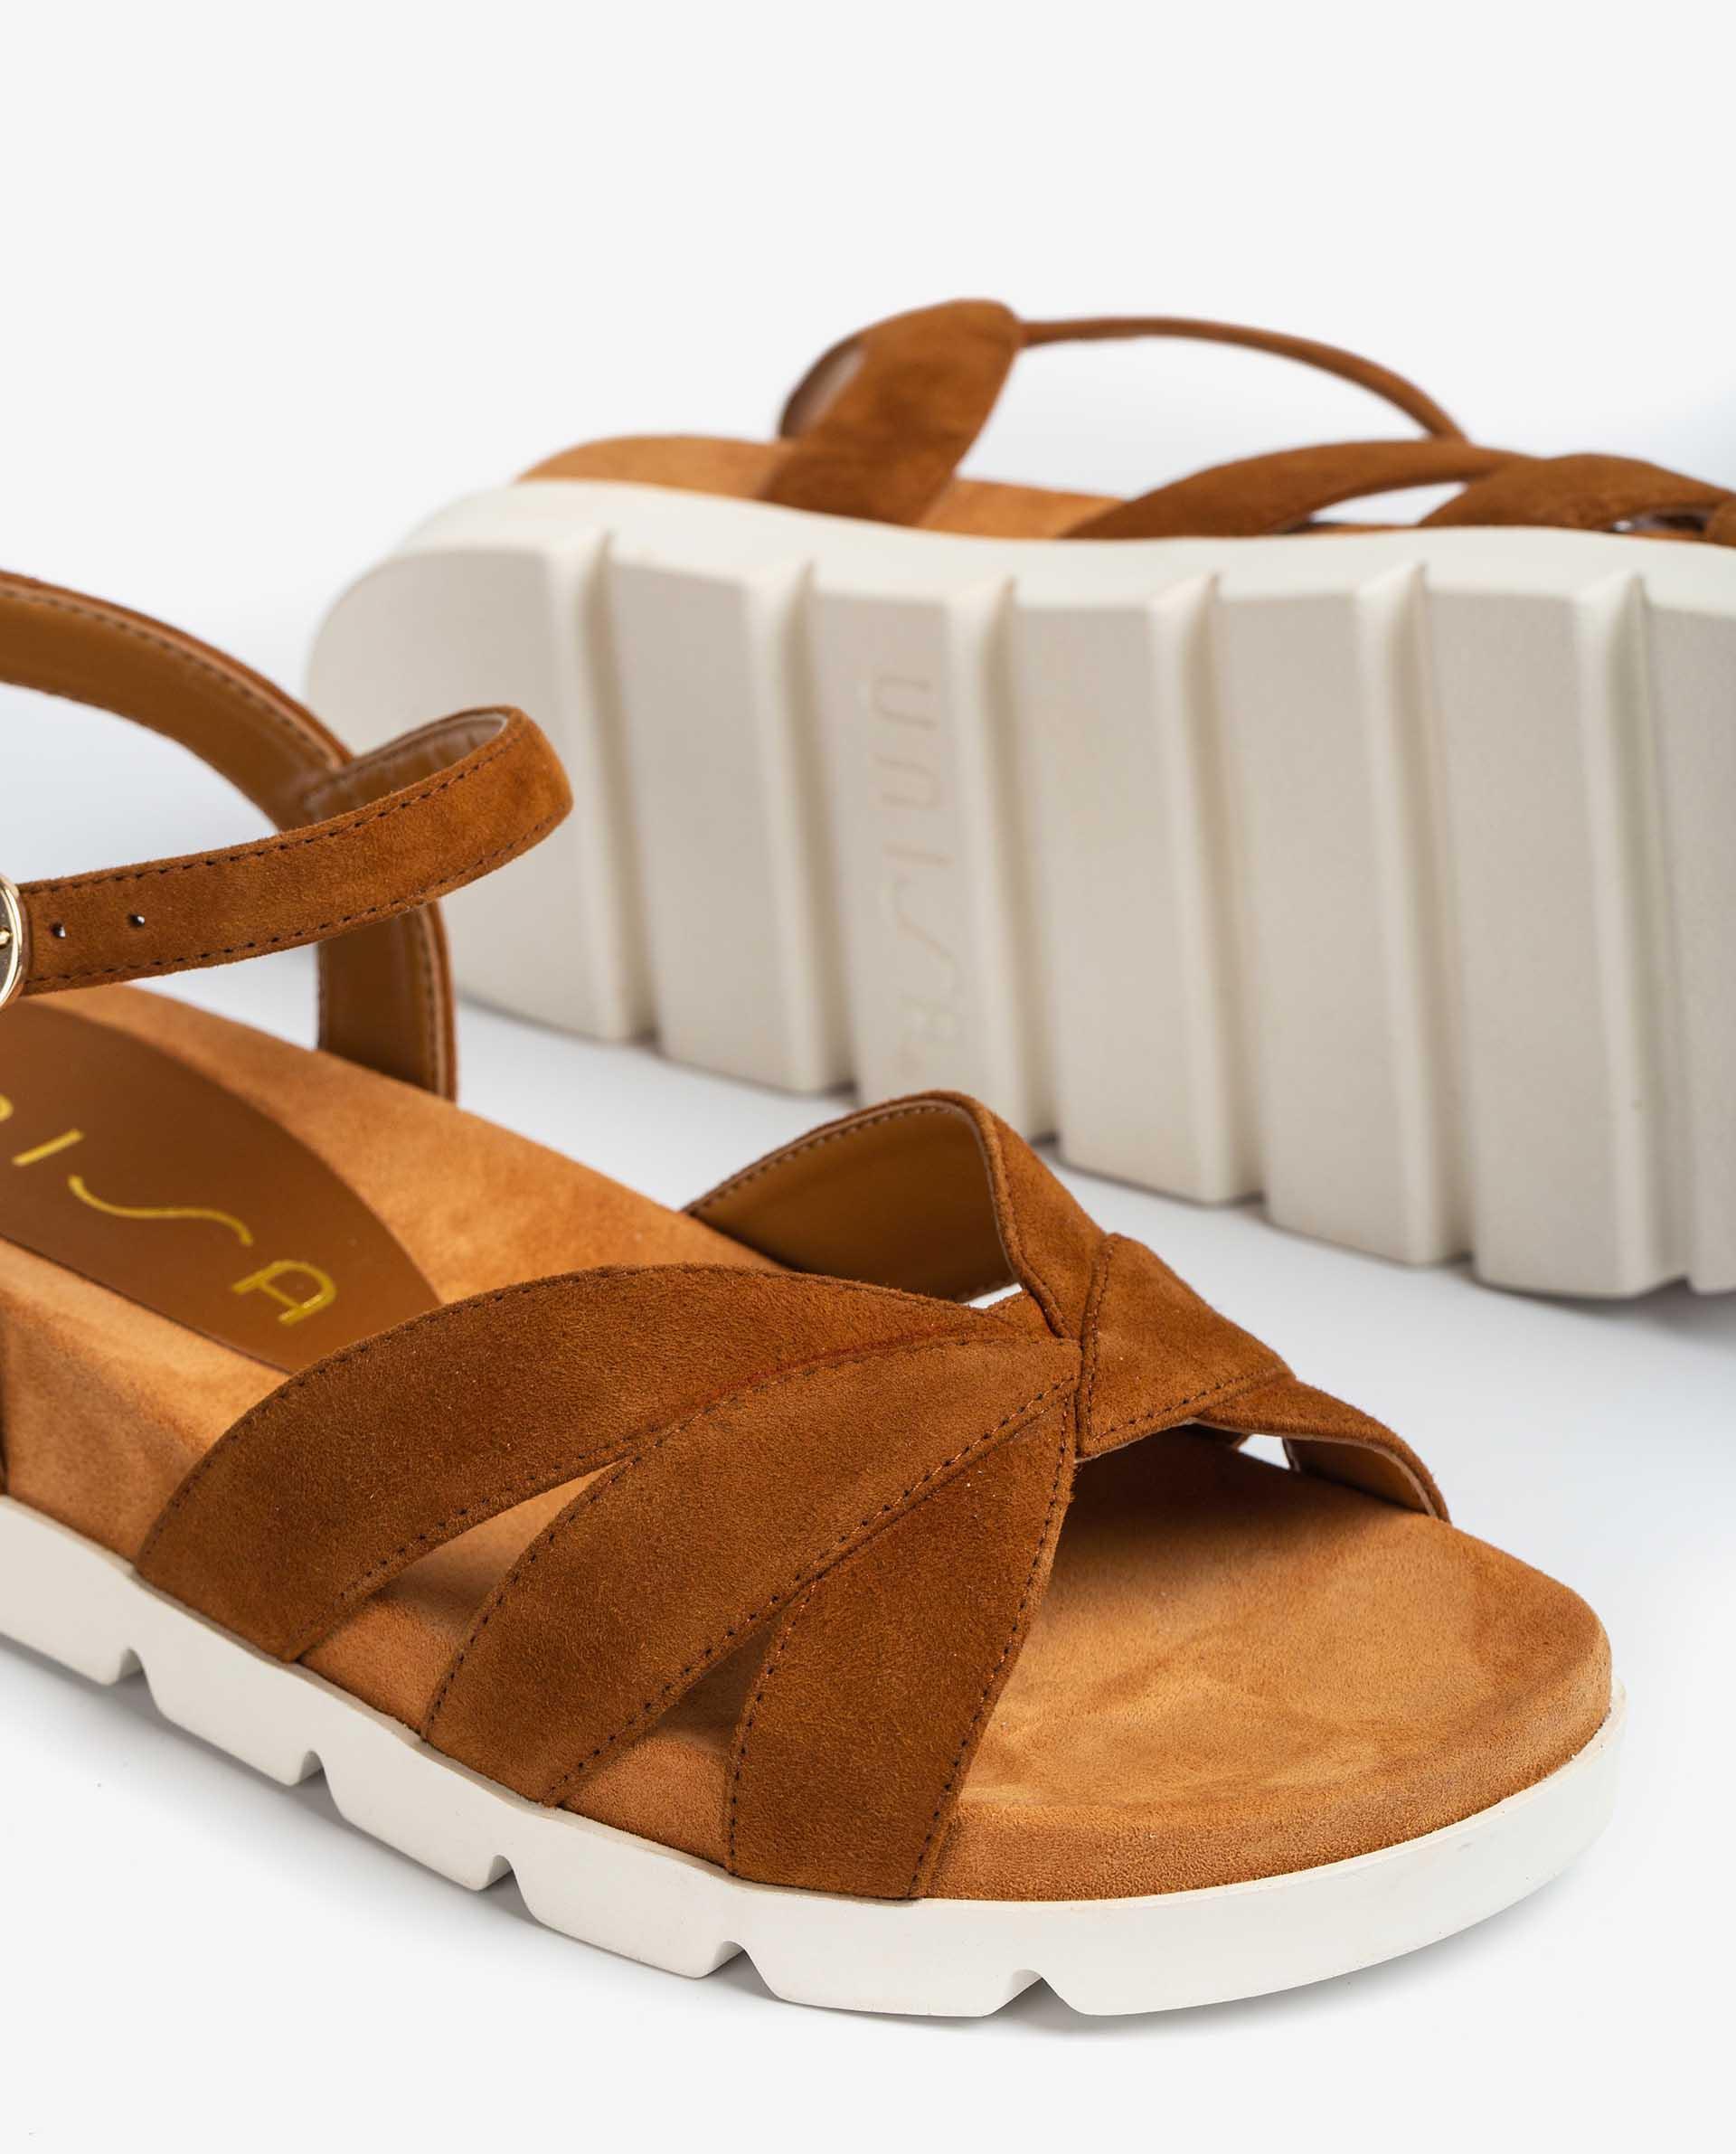 UNISA Flache Sandalen mit Sportsohle CEDILLO_KS 5